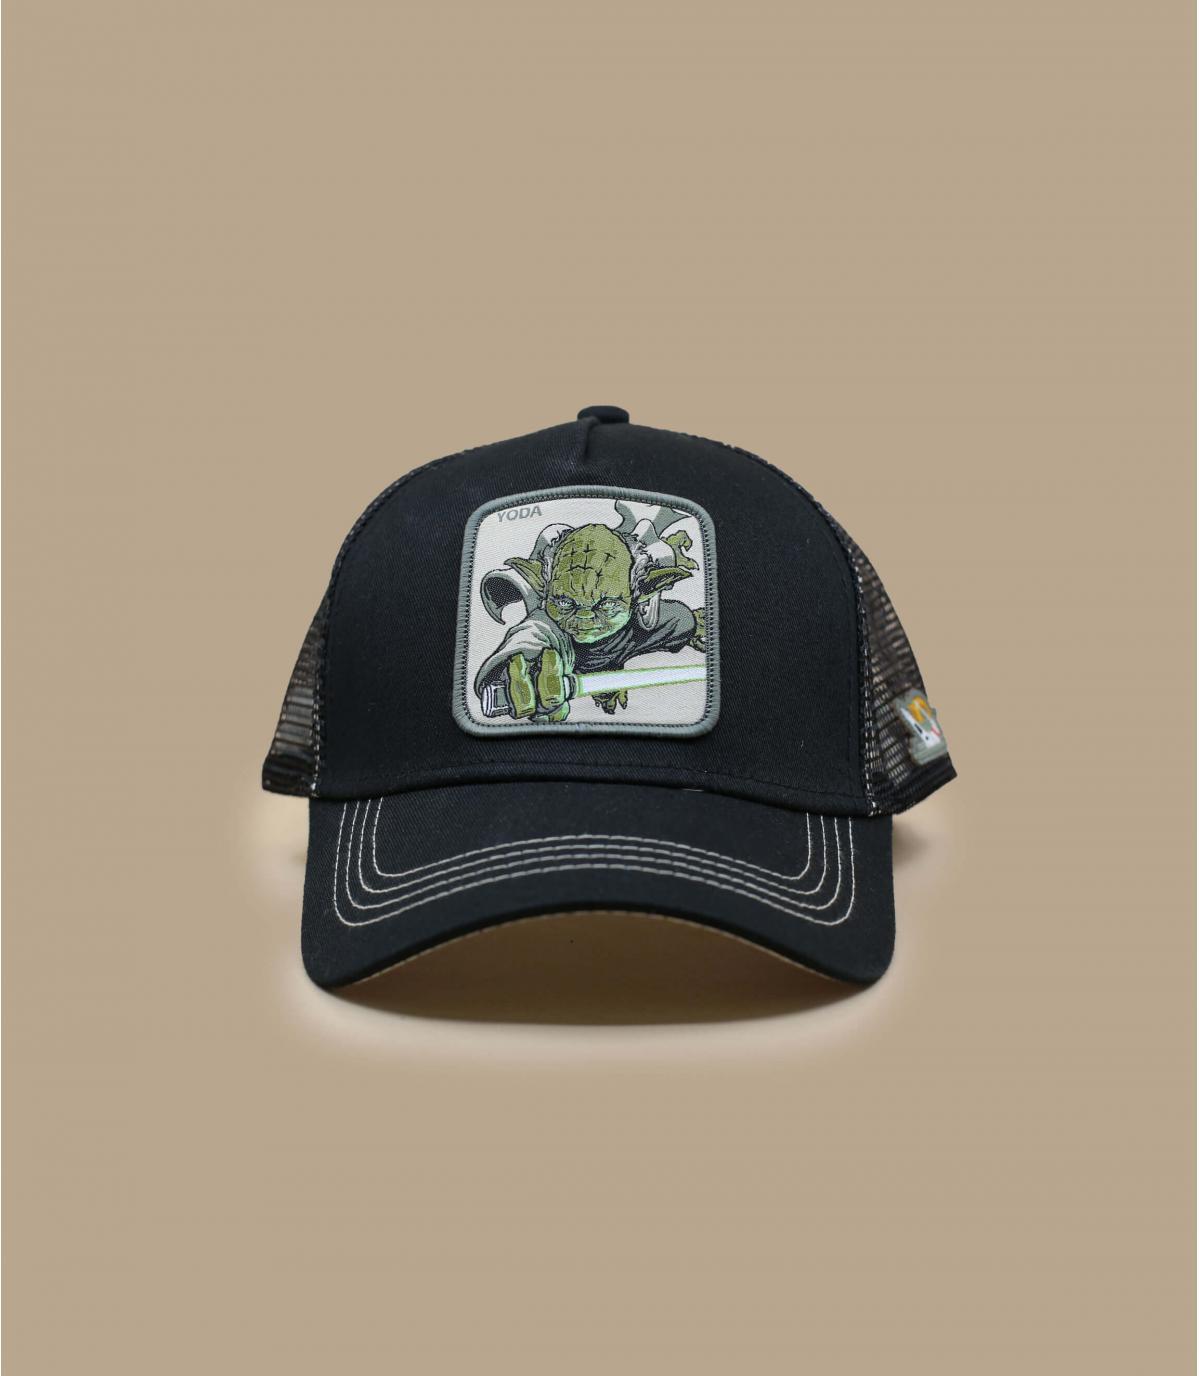 Details Trucker Yoda - afbeeling 2